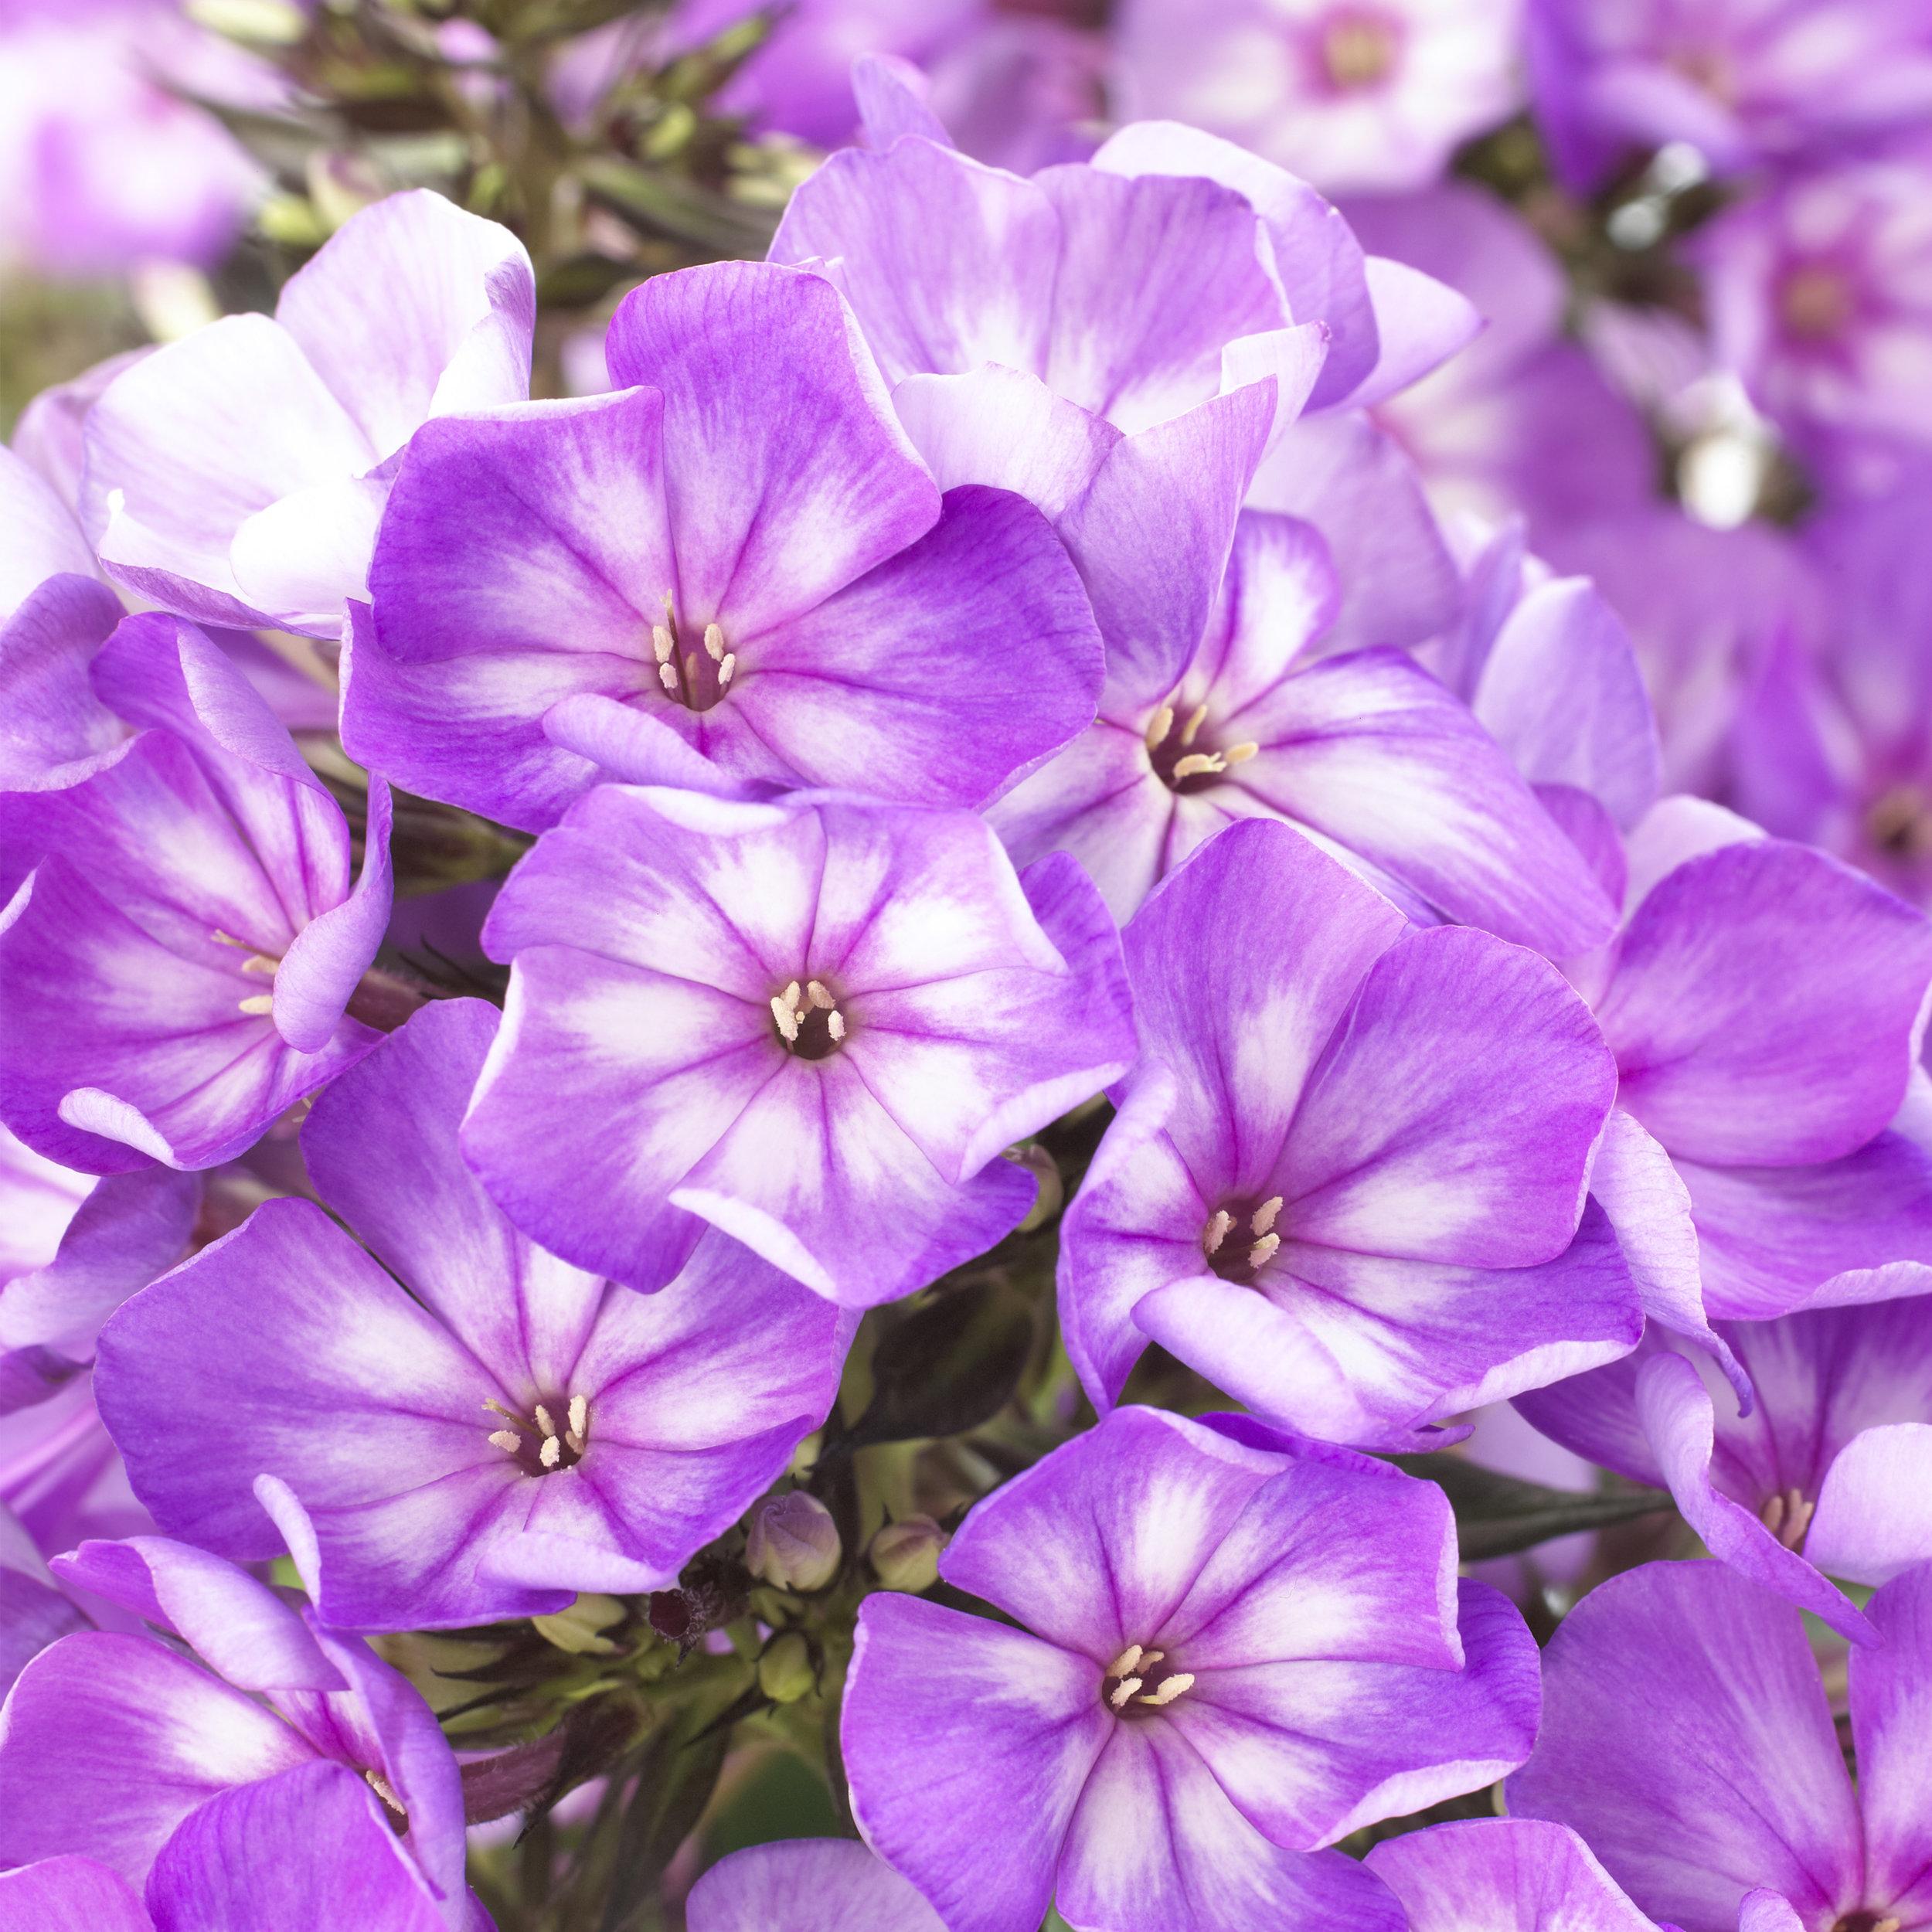 HR_Vegetative_Phlox_Sweet_Summer_Sweet_Summer_Surprise__Violet_White_70028360.jpg